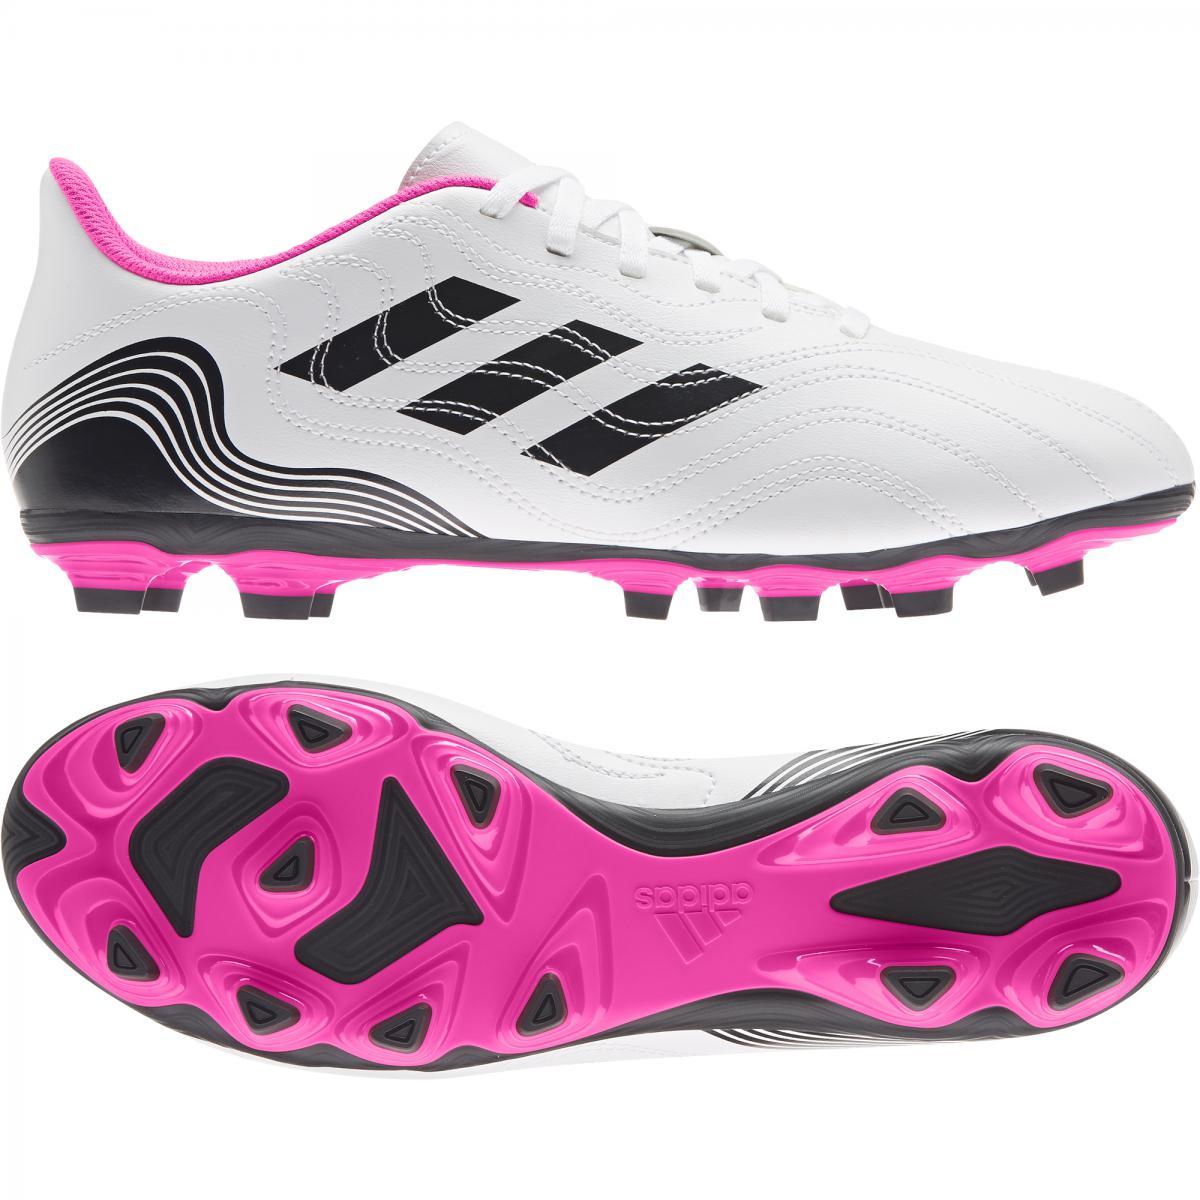 Adidas  Copa Sense.4 Fxg, fotballsko